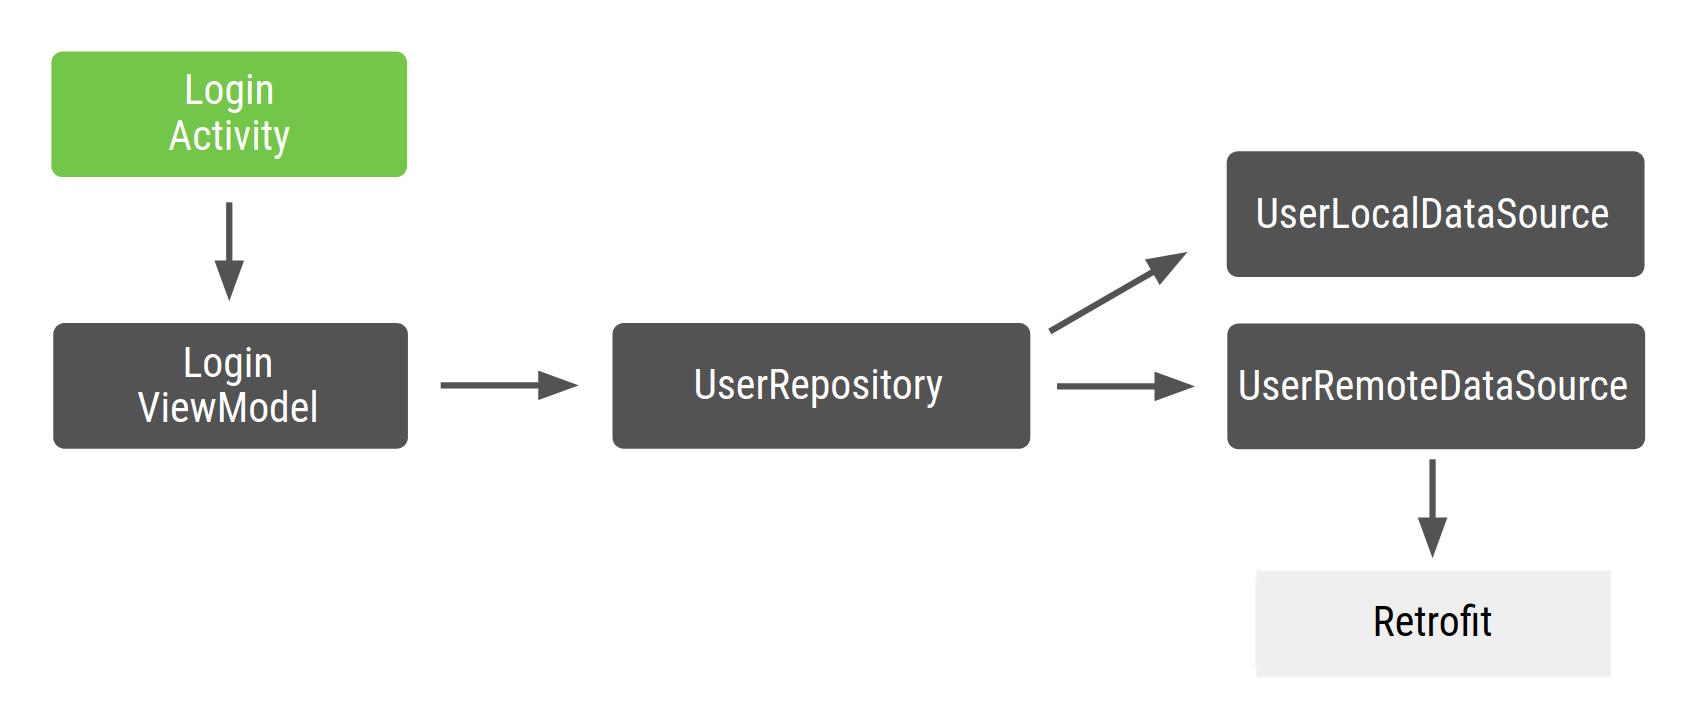 LoginActivity는 LoginViewModel에 종속되며, 이 클래스는 다시 UserRepository에 종속되고, 이 클래스는 다시 UserLocalDataSource 및 UserRemoteDataSource에 종속되며, 이는 다시 Retrofit에 종속됩니다.